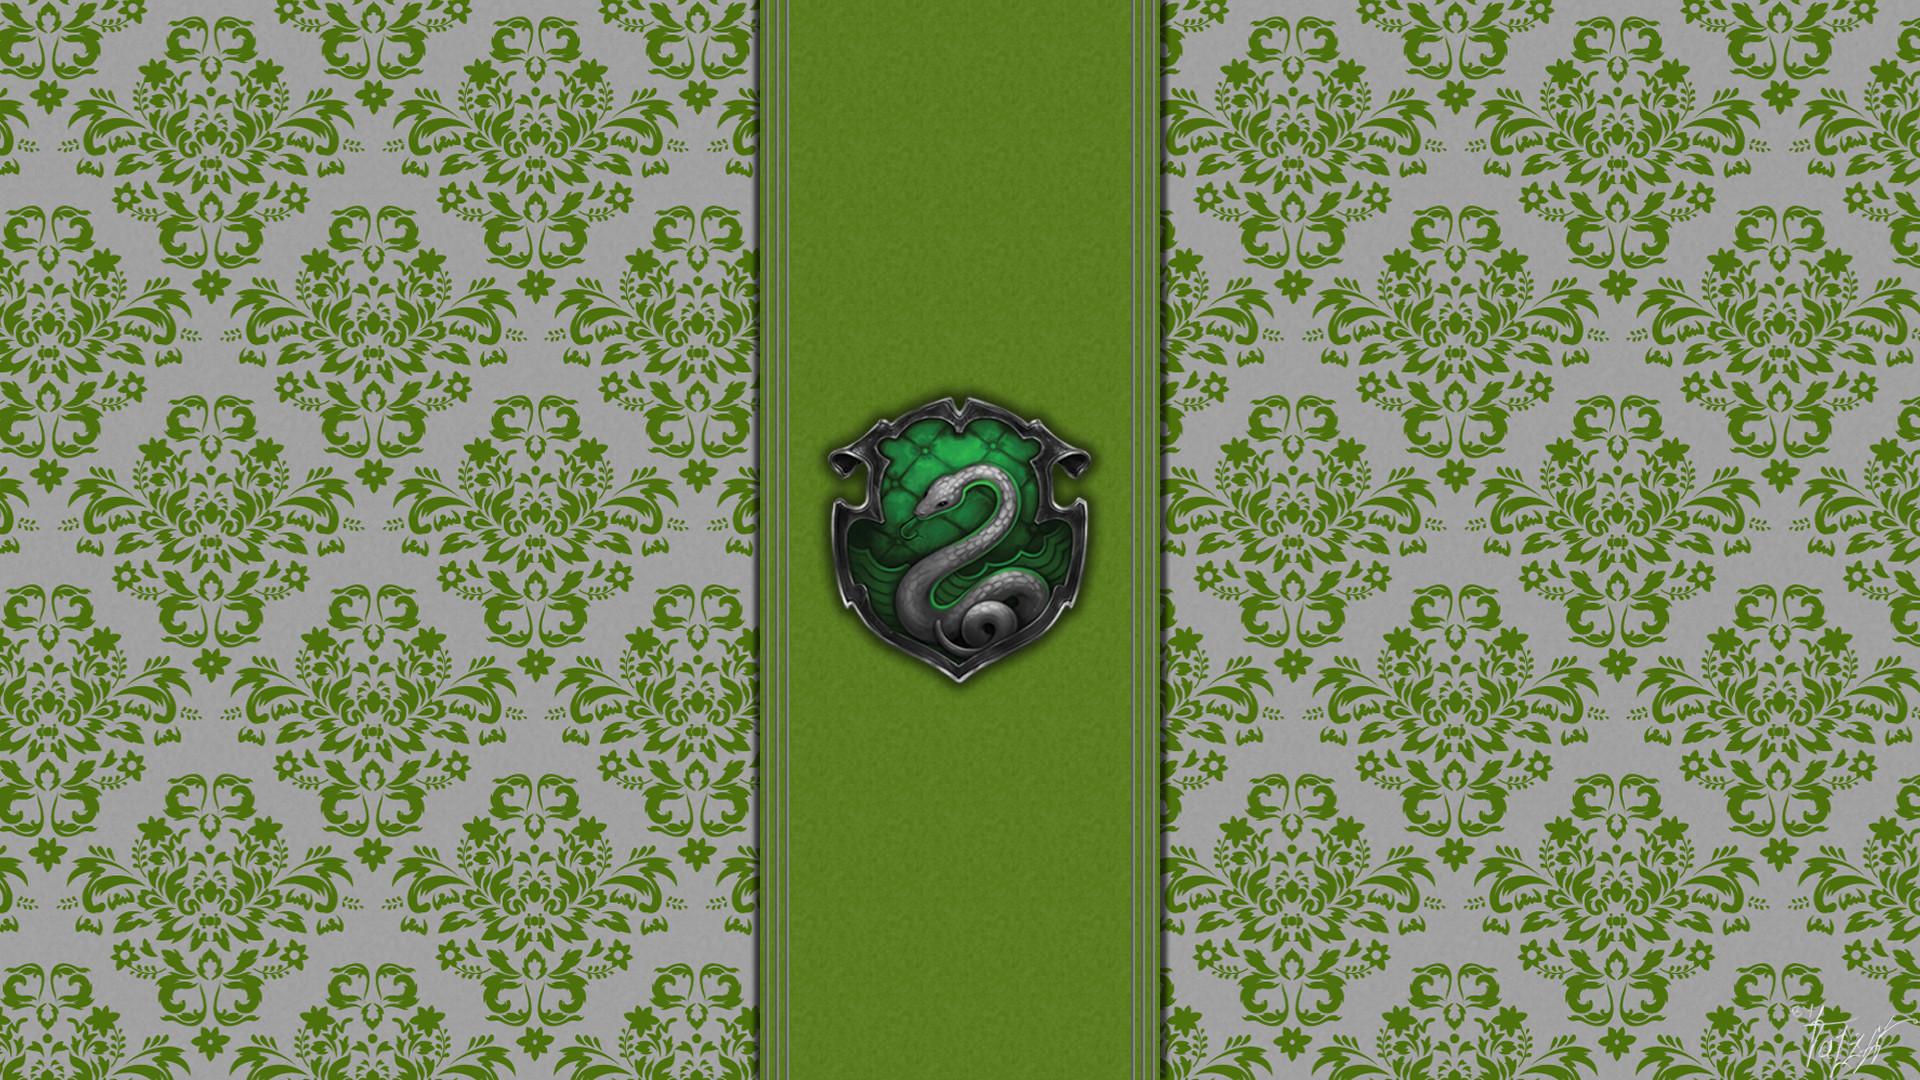 hogwarts_house_wallpaper___slytherin_by_theladyavatar-d4ol92u.jpg  (1920×1080)   Harry Potter and the Pinterest Board   Pinterest   Slytherin,  Harry potter …